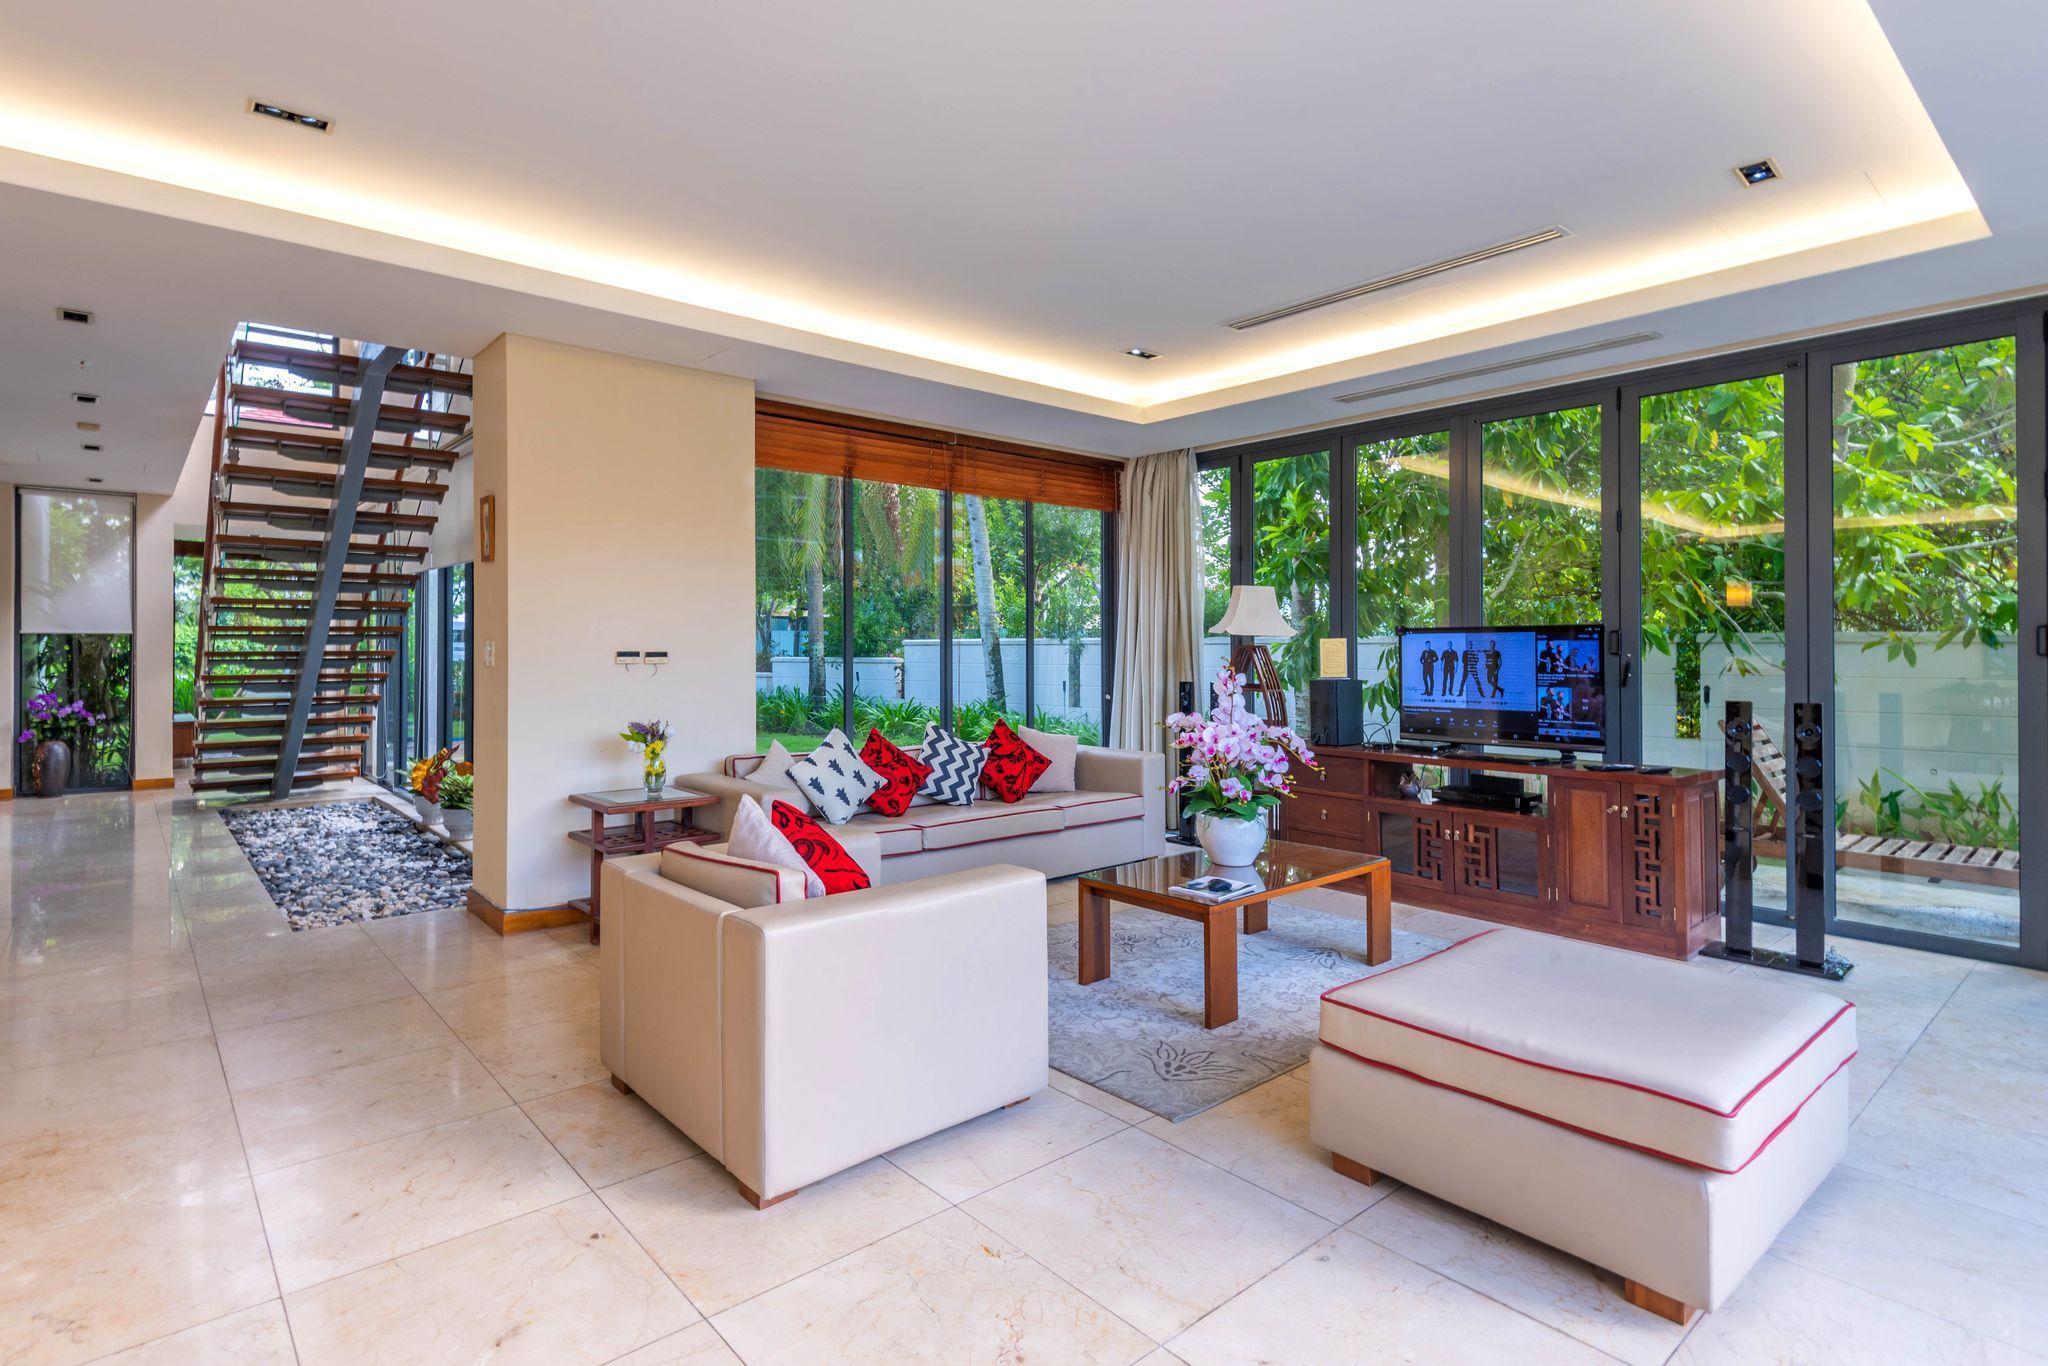 Ocean Luxury 3 Bedrooms Garden View Villa Da Nang